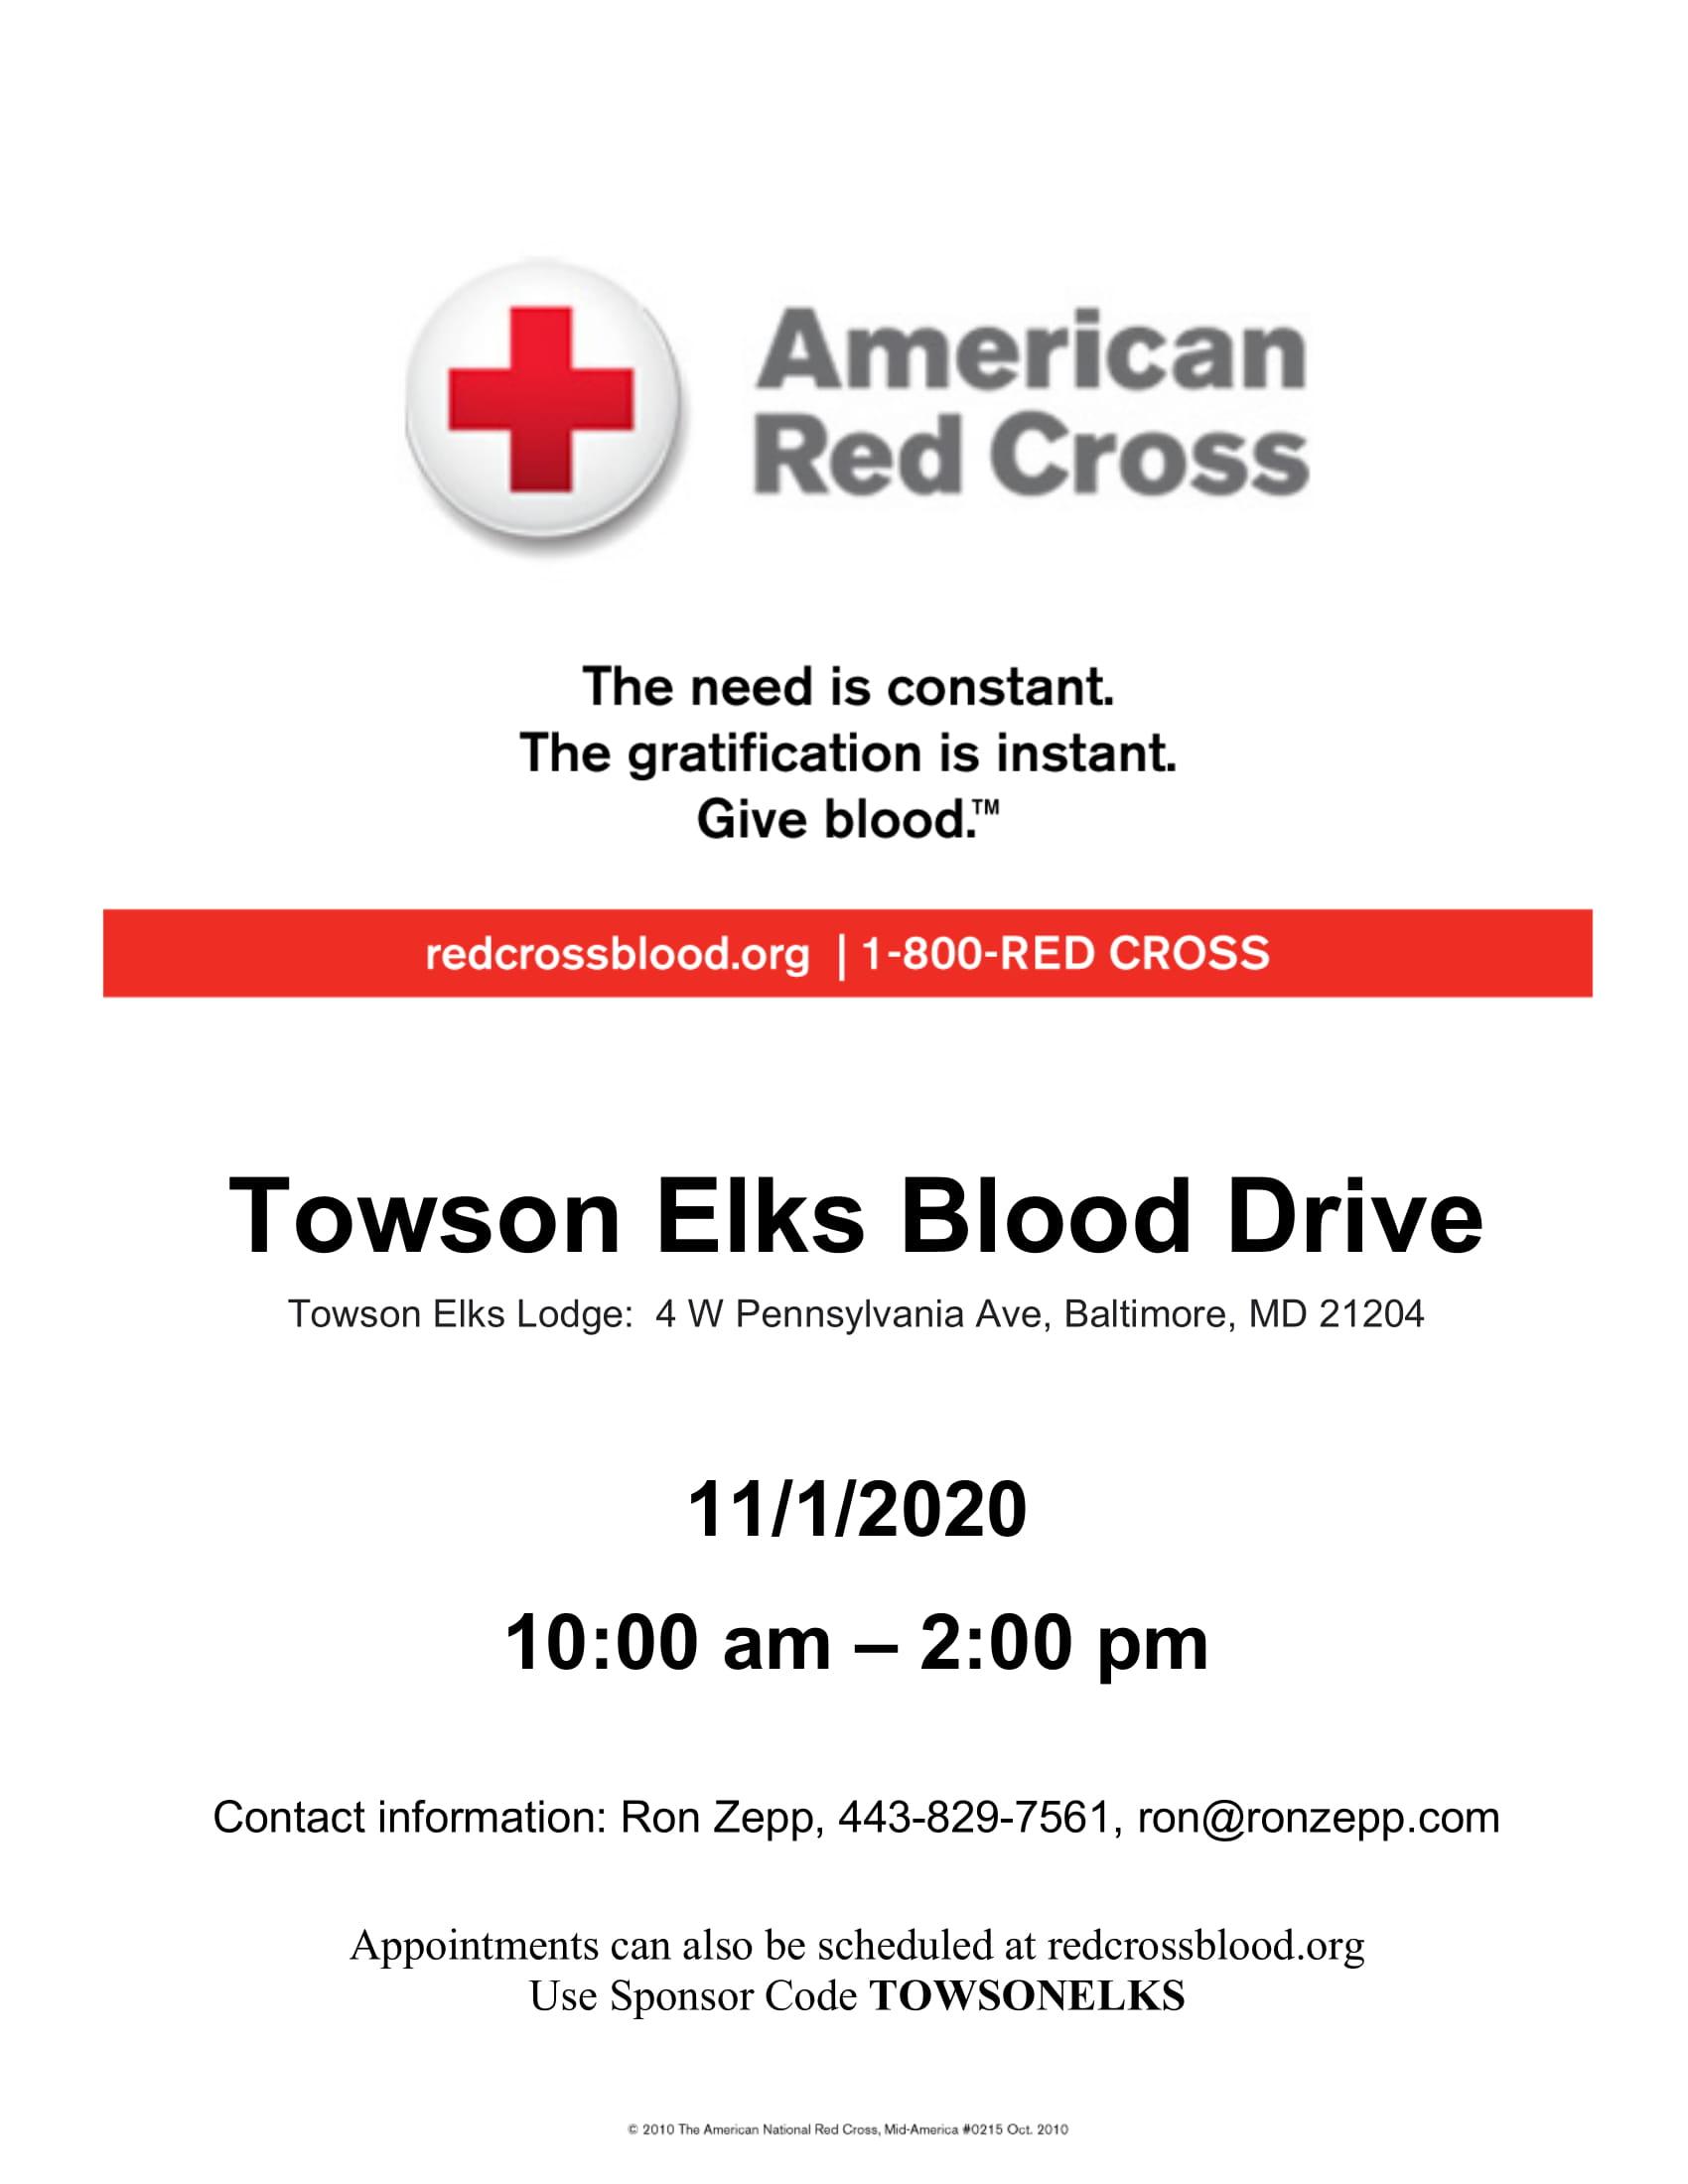 Elks Blood Drive 11-1-1